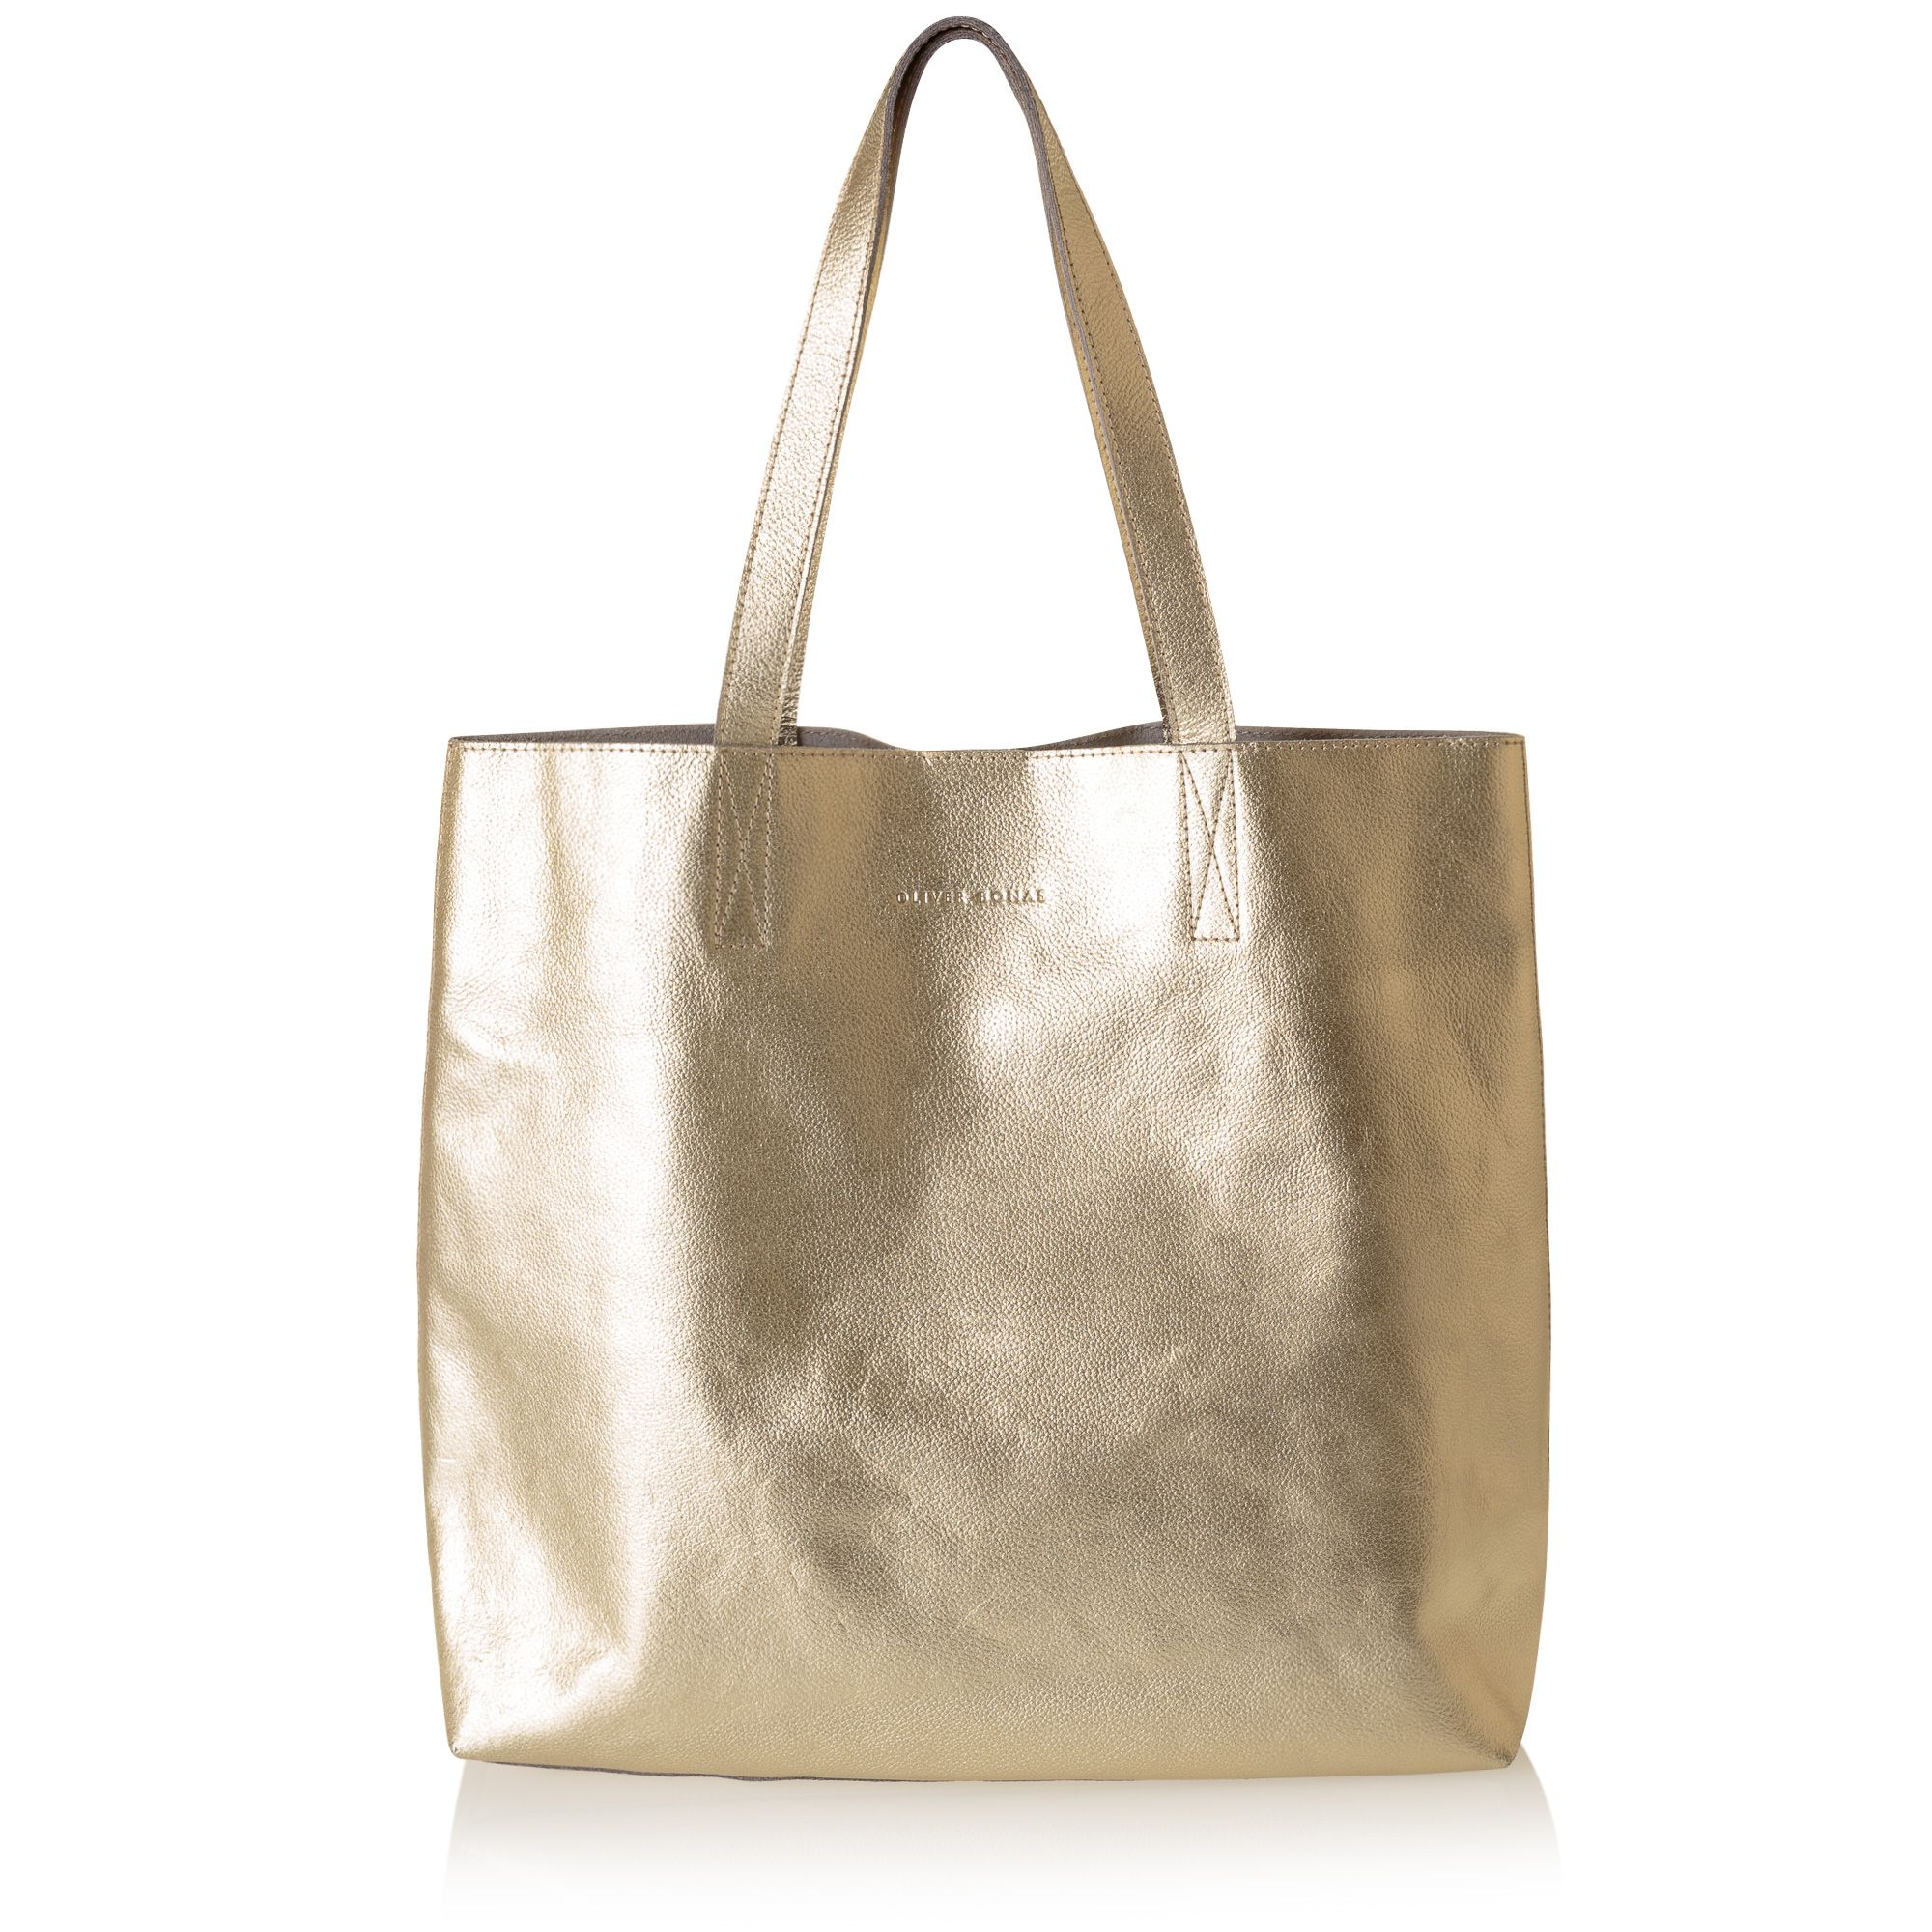 Gold Metallic Leather Handbag From Oliver Bonas